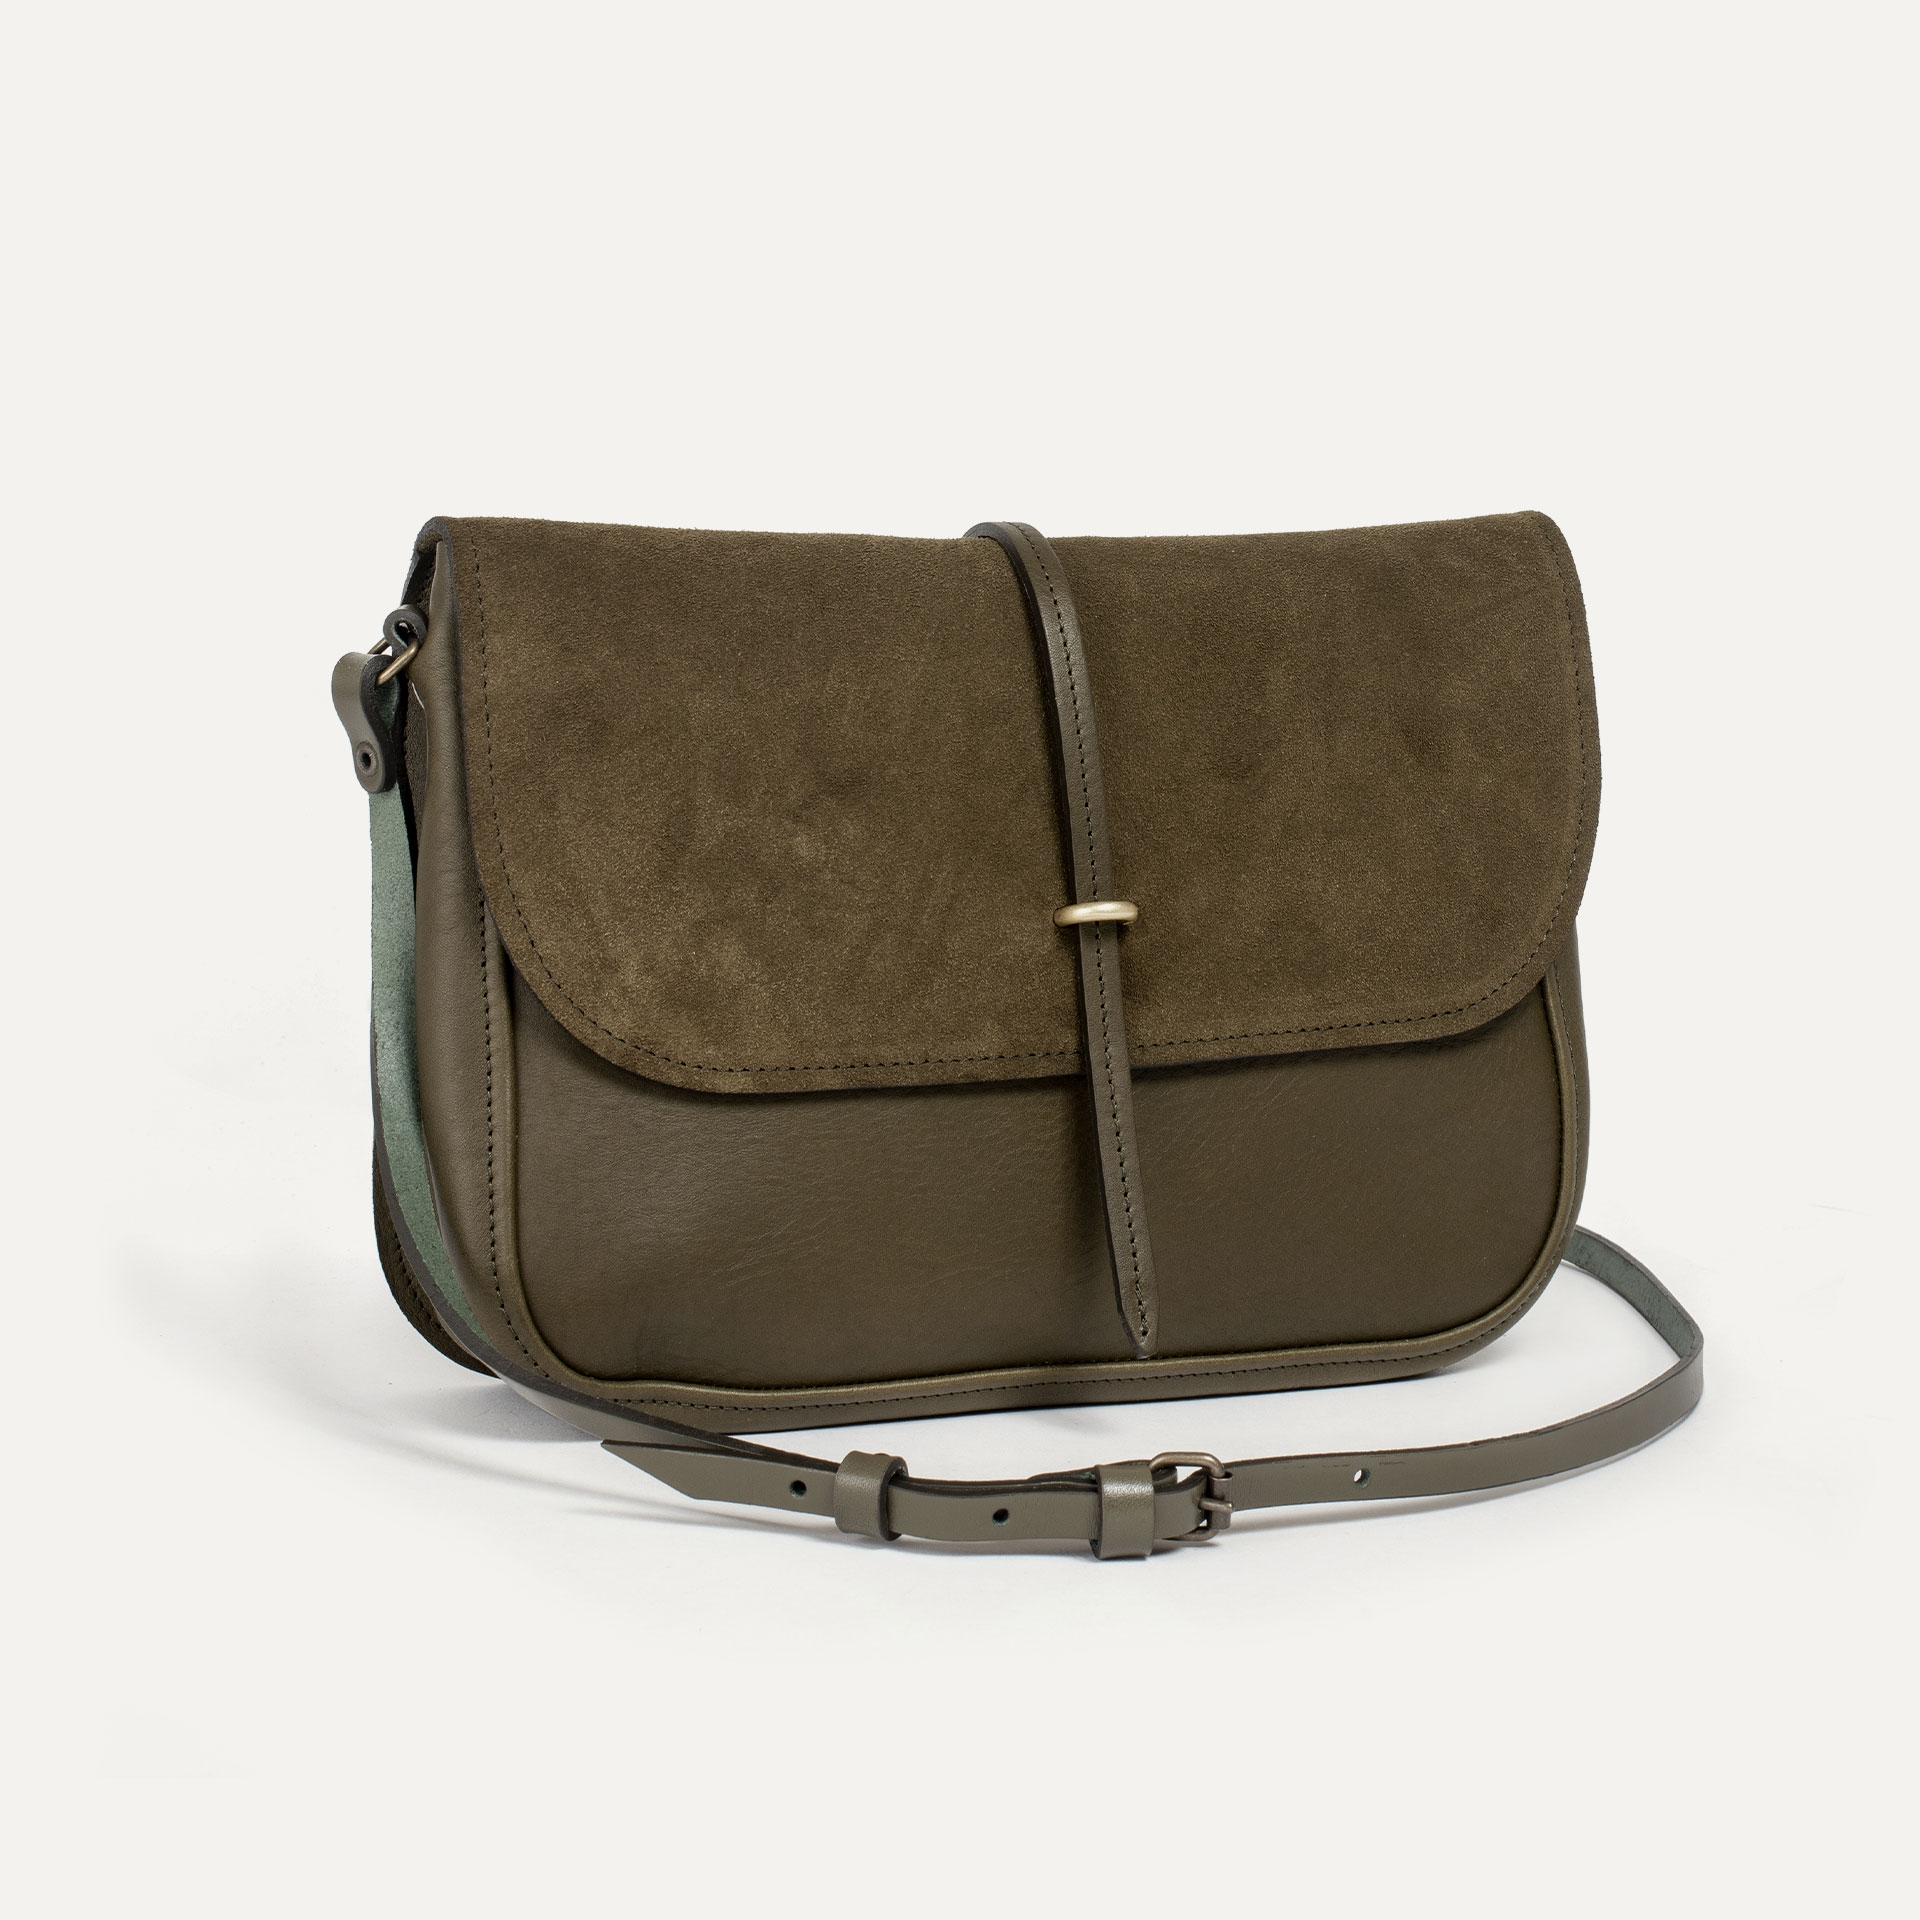 Pastel handbag - Khaki / Mix (image n°2)